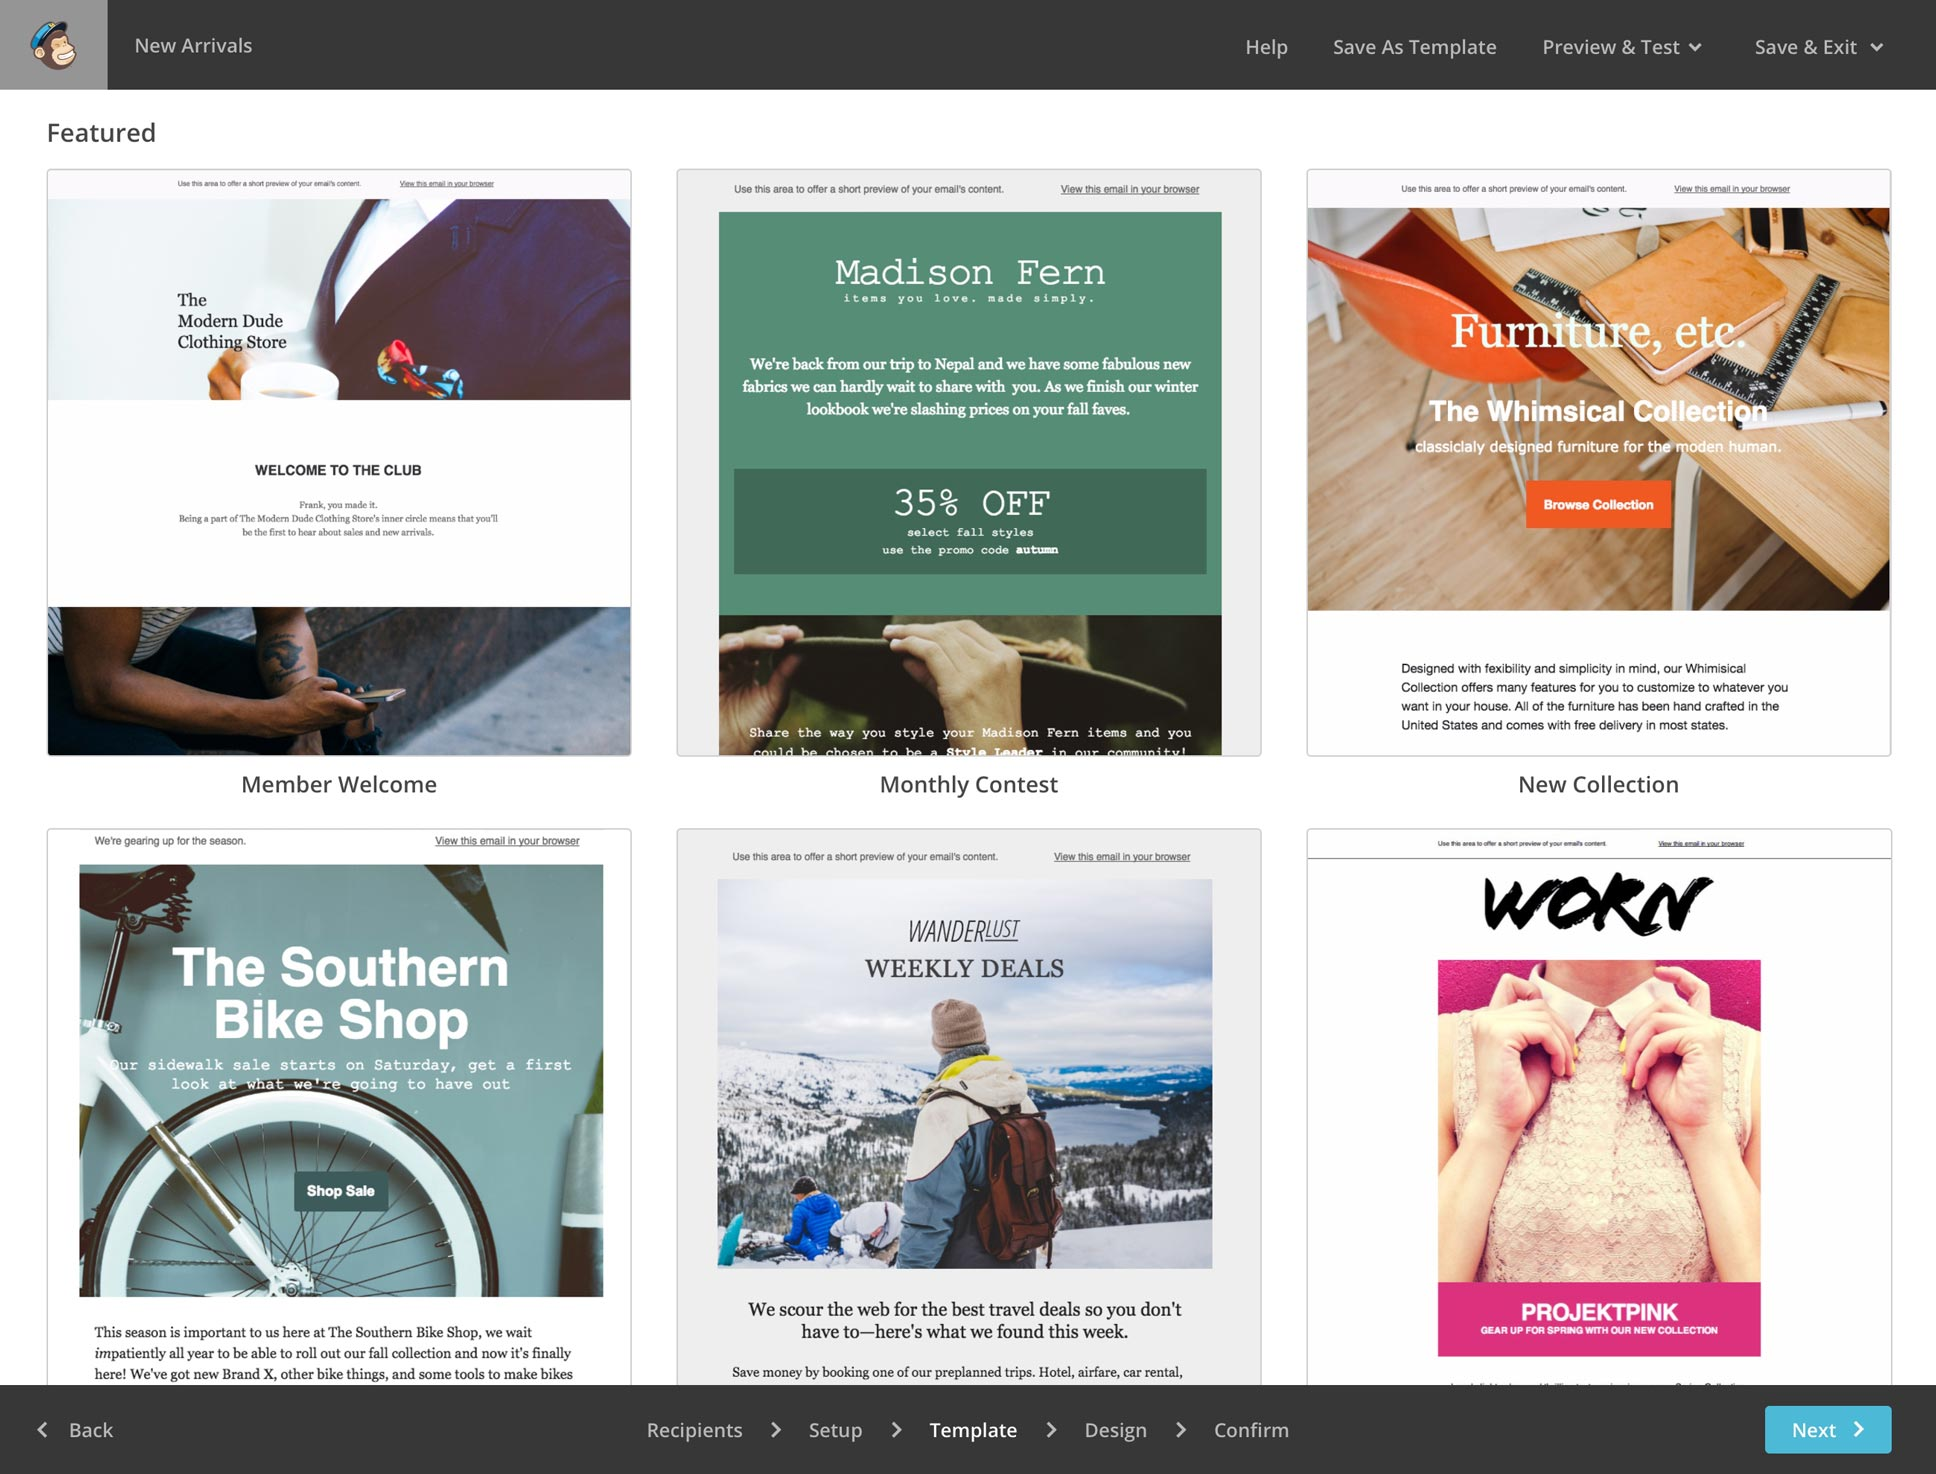 mailchimp ecommerce templates - e mail marketing sam helpt